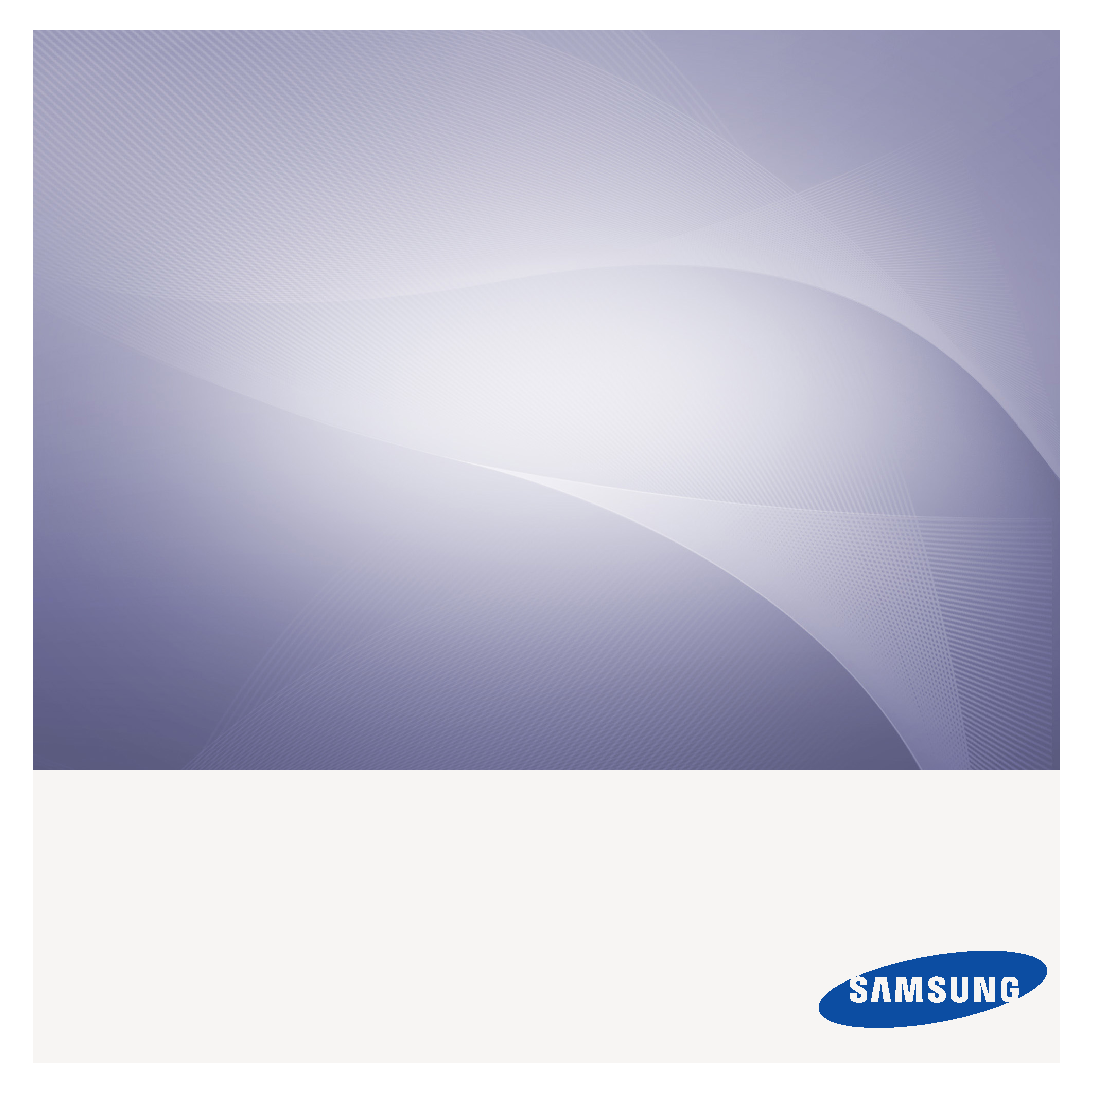 Samsung scx-4720f